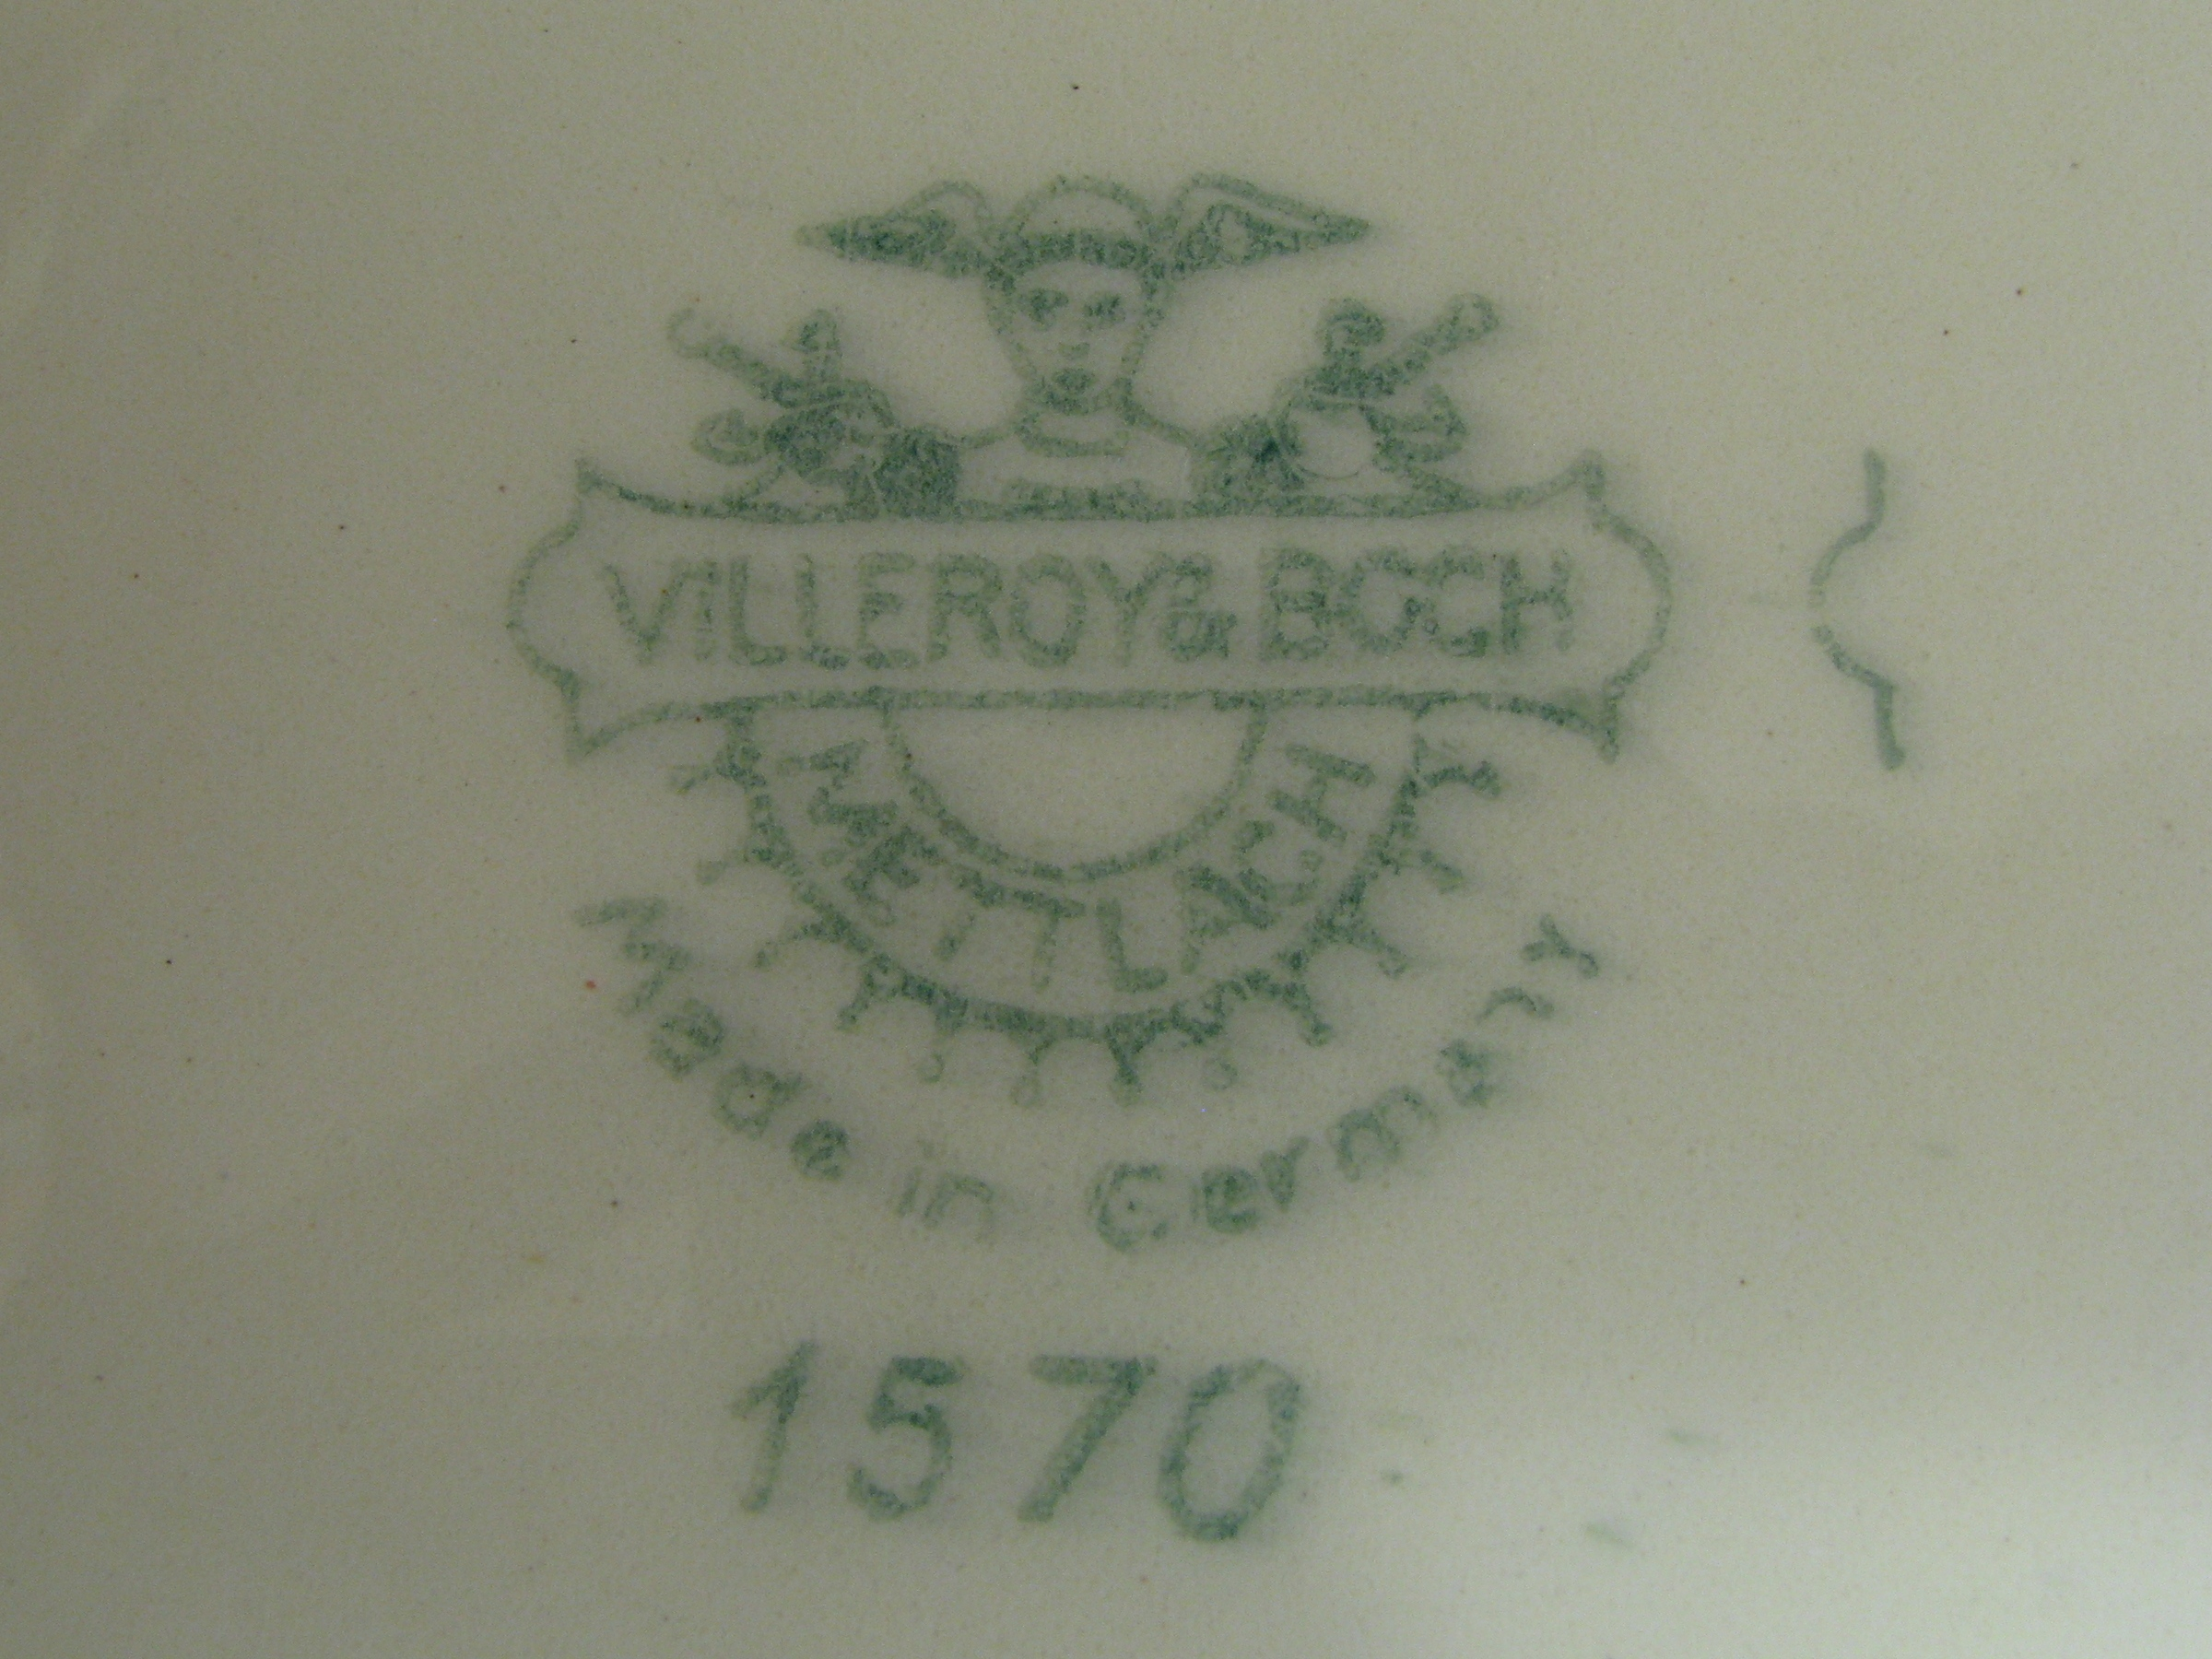 Villeroy And Boch Xmas Decorations